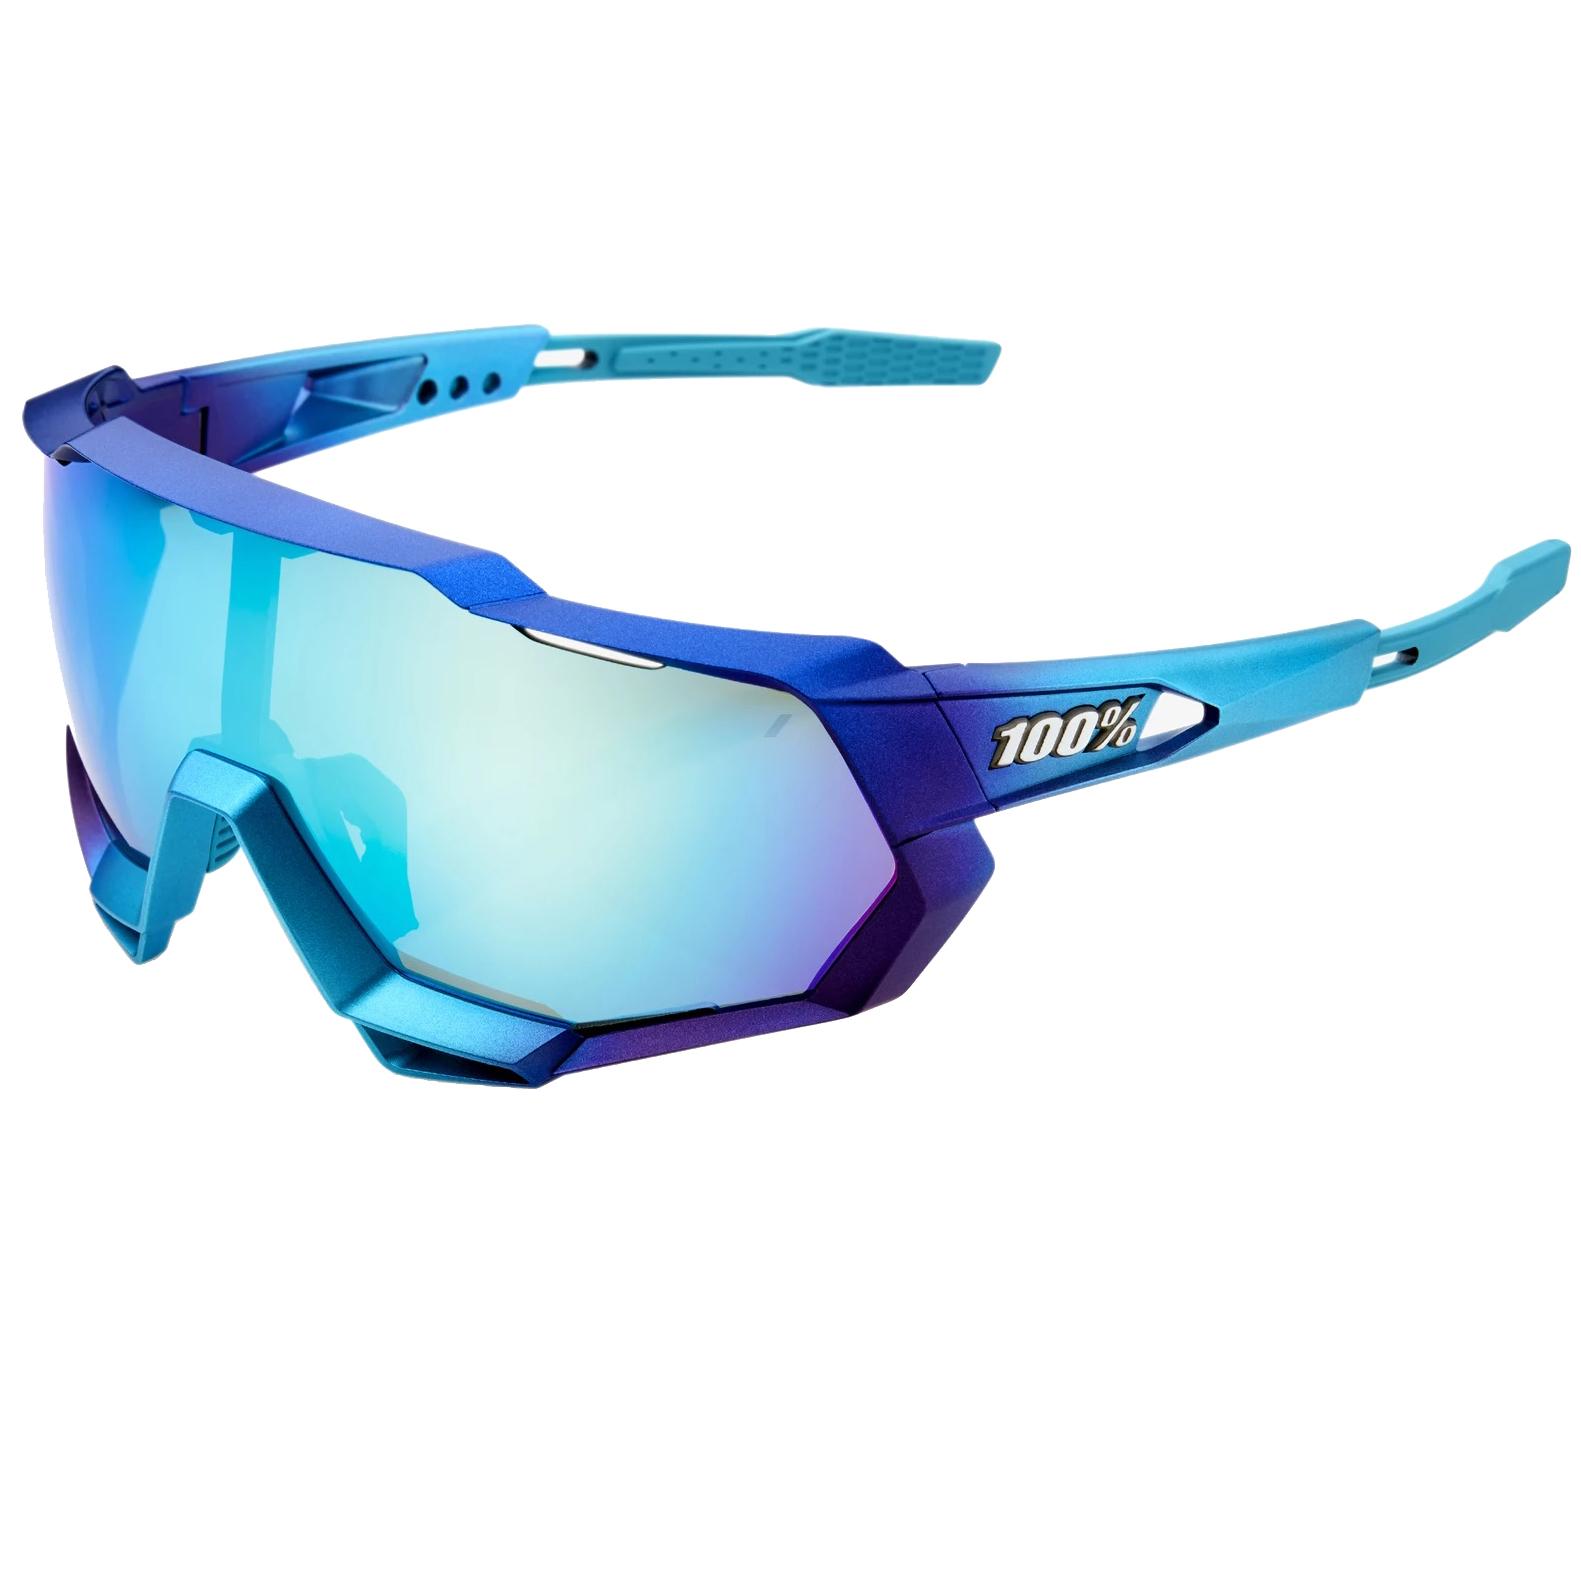 100% Speedtrap Mirror Lens Glasses - Matte Metallic Into the Fade/Blue Topaz Multilayer + Clear